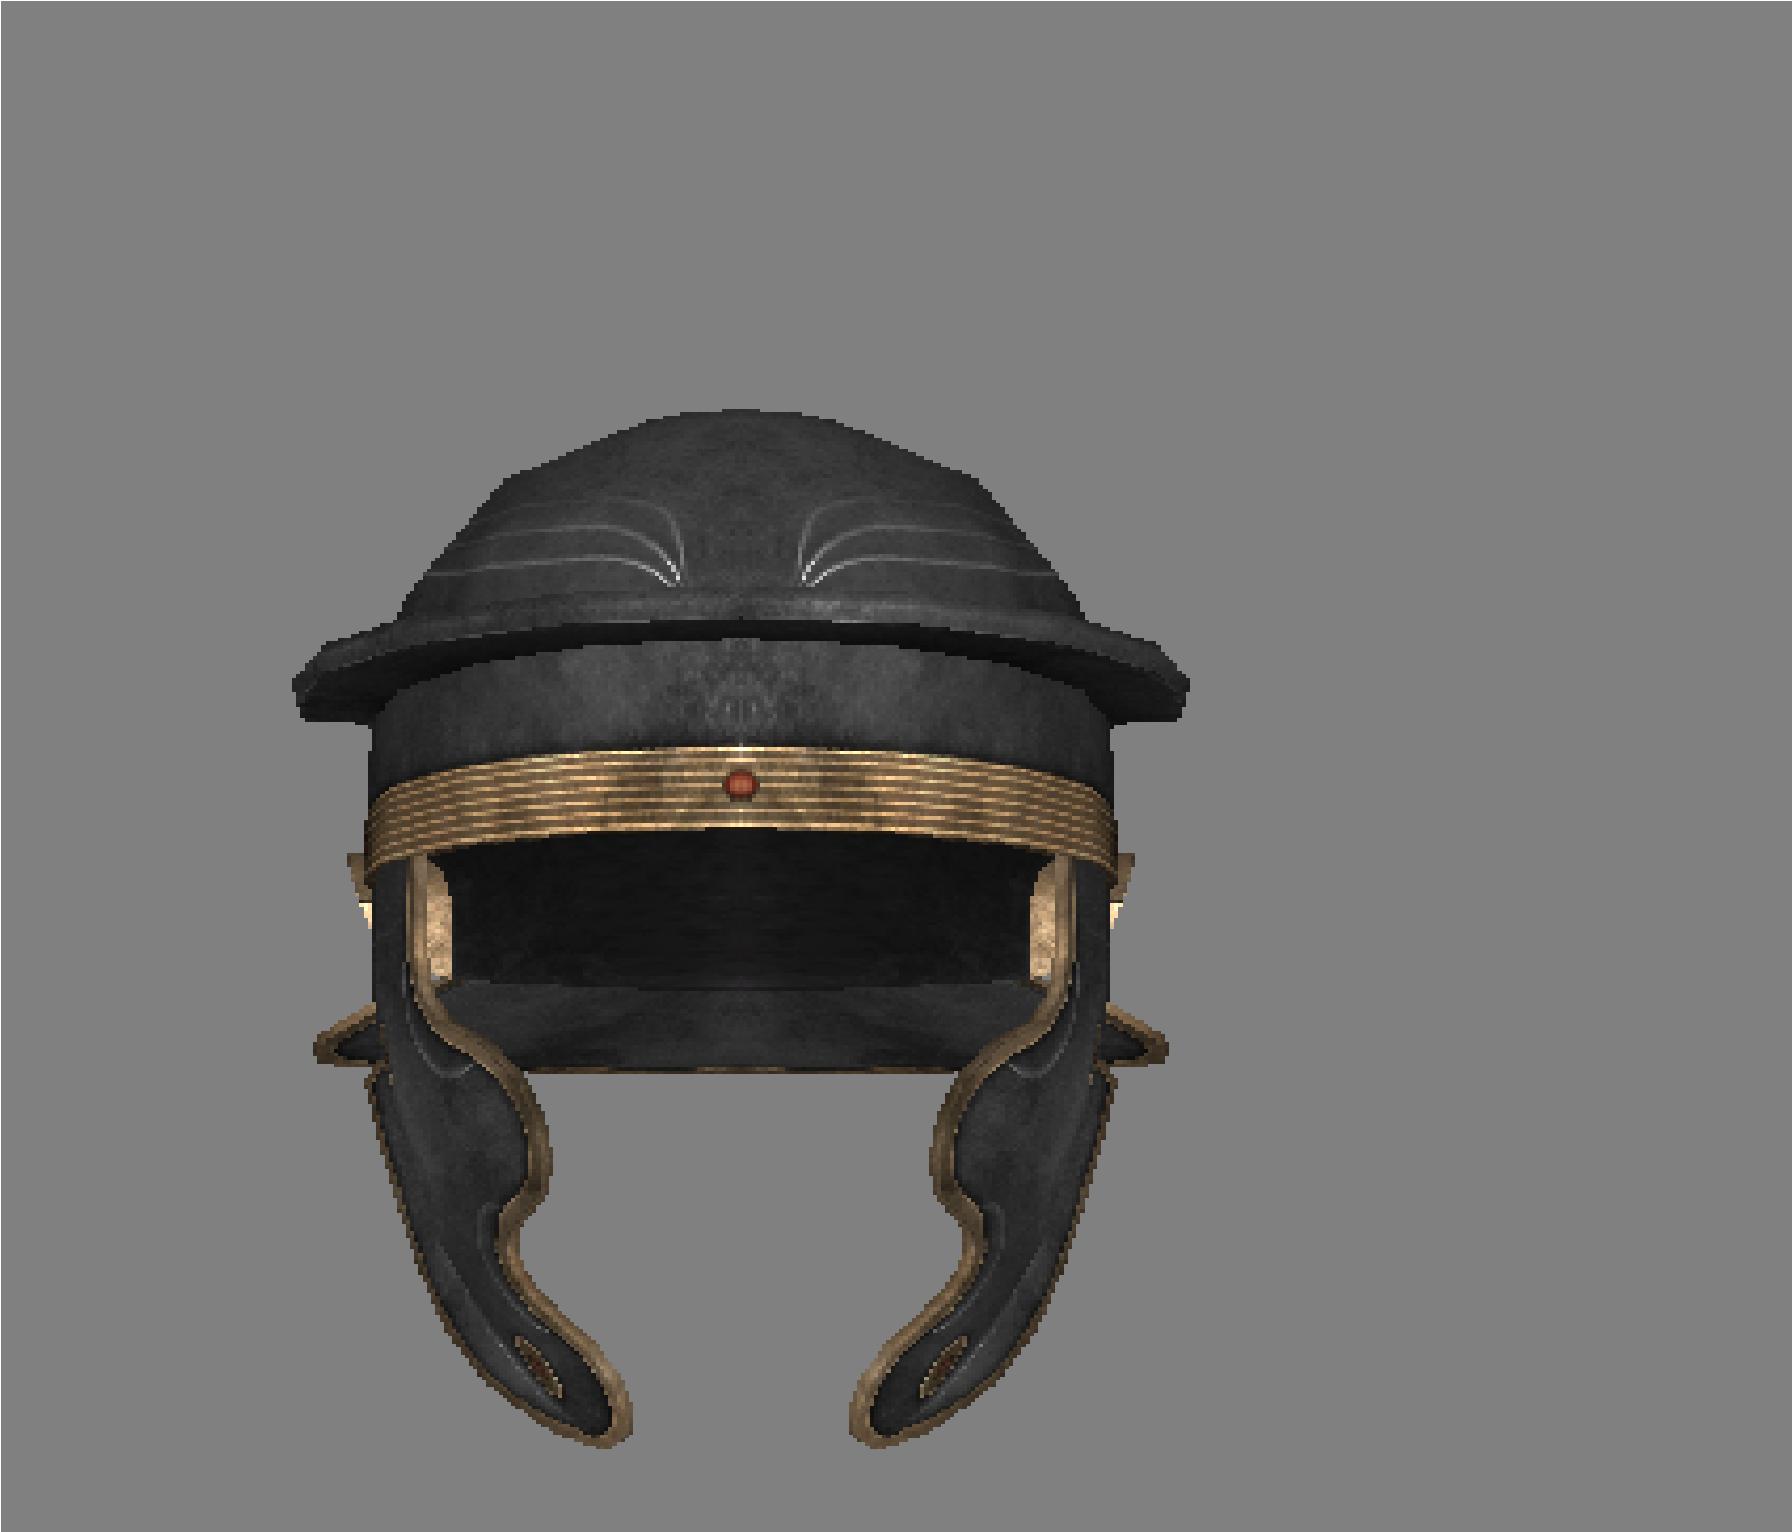 New legionary helmet